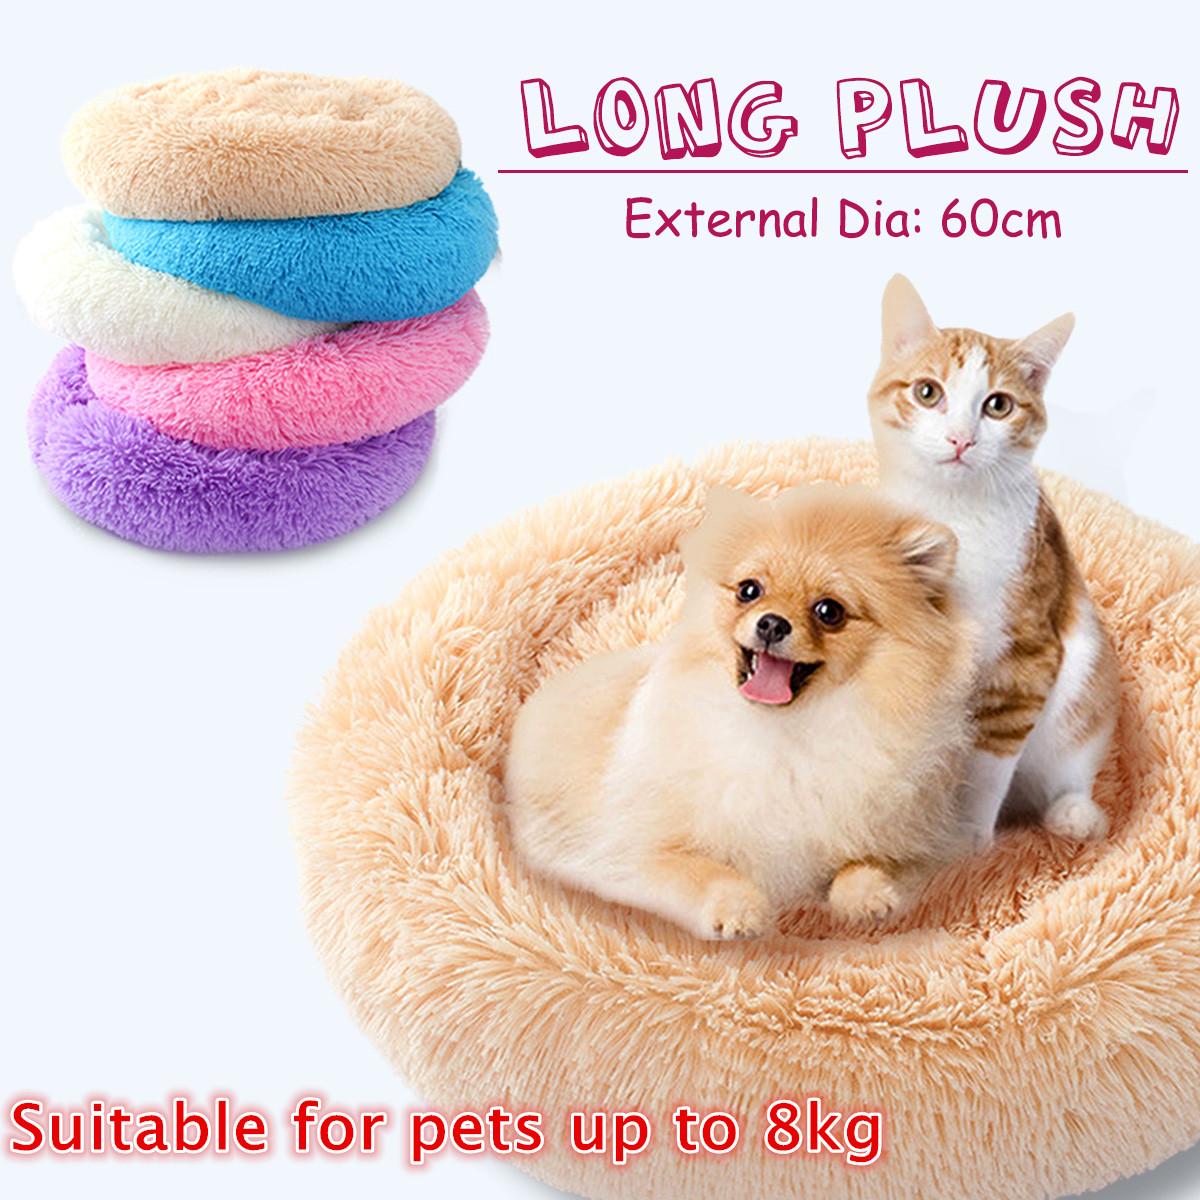 Cuddle Round Pet Bed Orthopedic Long Plush Soft Mattress Sleeping Nest Warming House Pet Cushion for Dog Puppy Cat